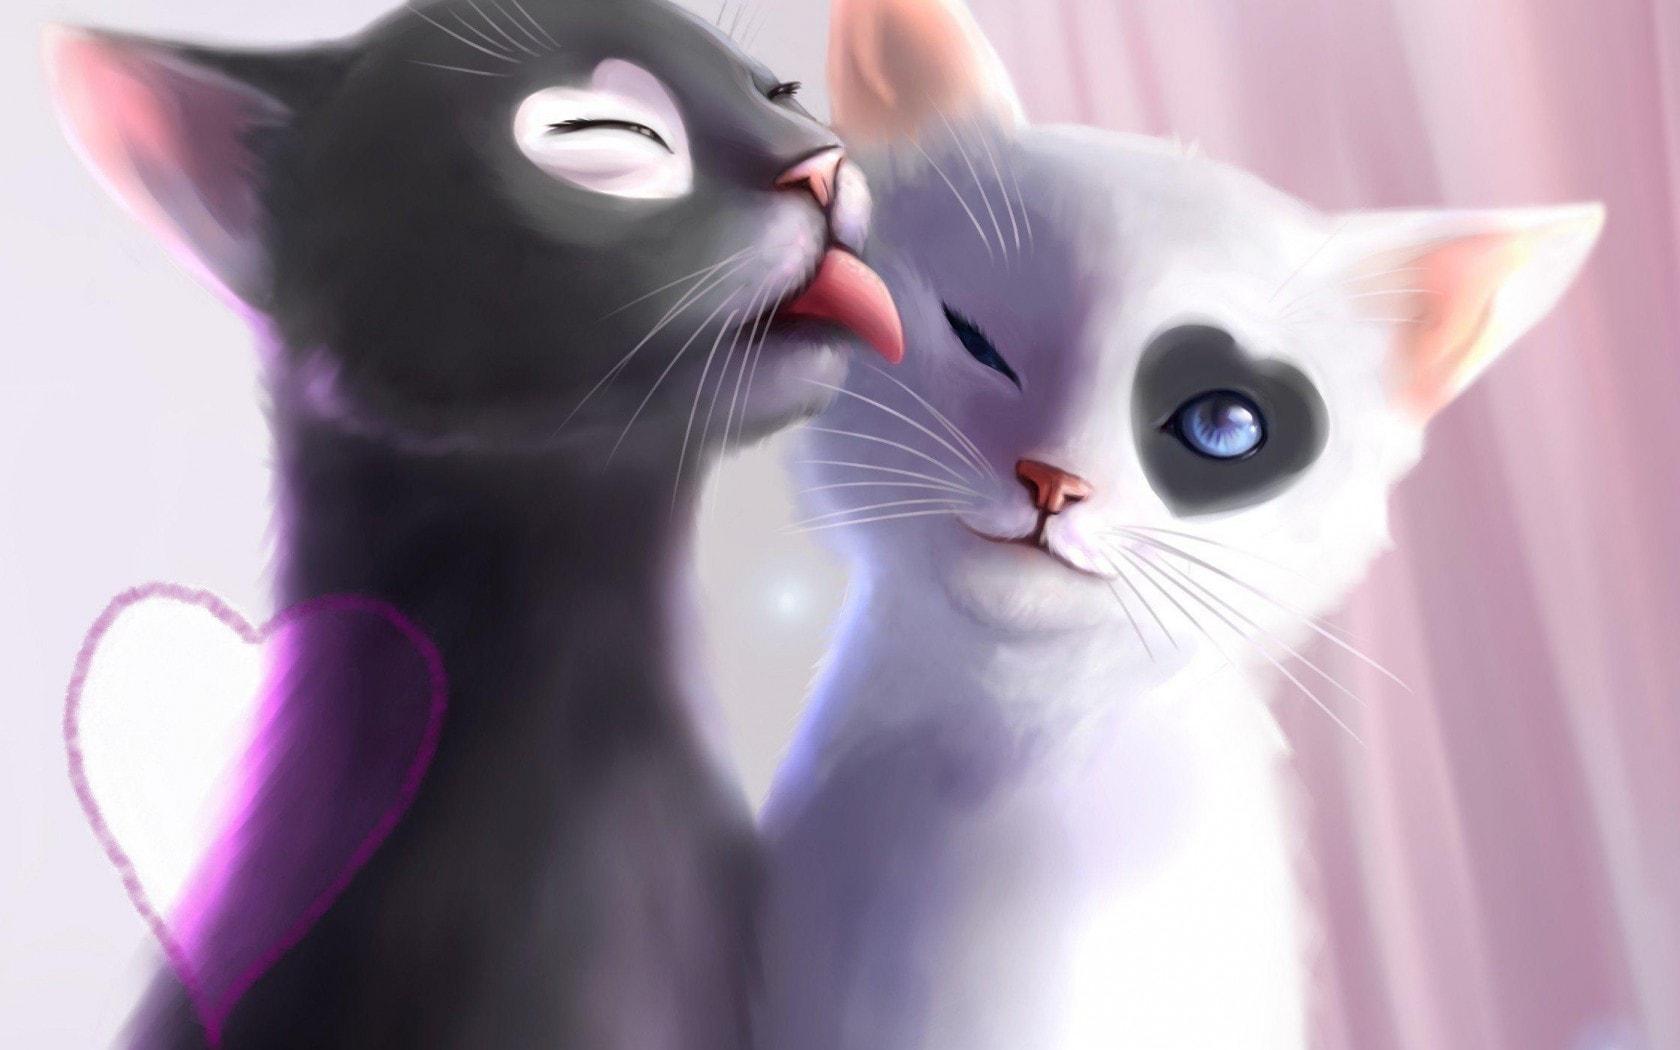 Картинка для Авы с кошками по знаку зодиака